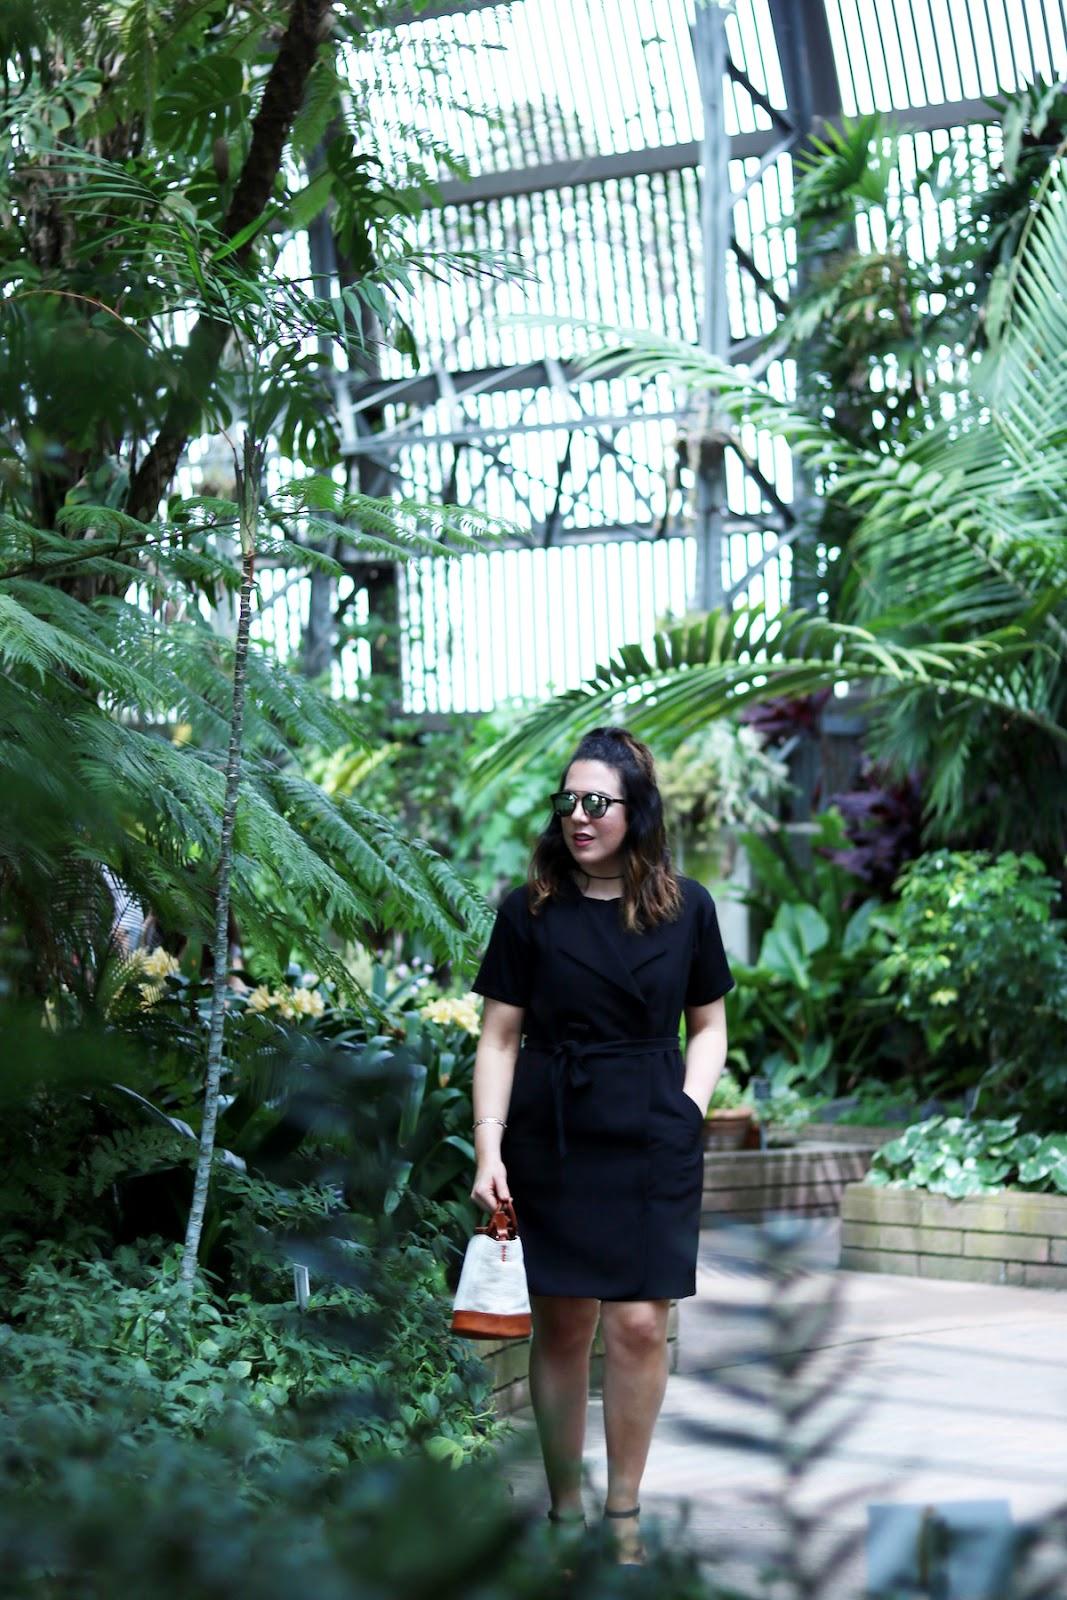 Le Chateau vest dress vancouver blogger cute summer outfit Balboa Park San Diego outfit